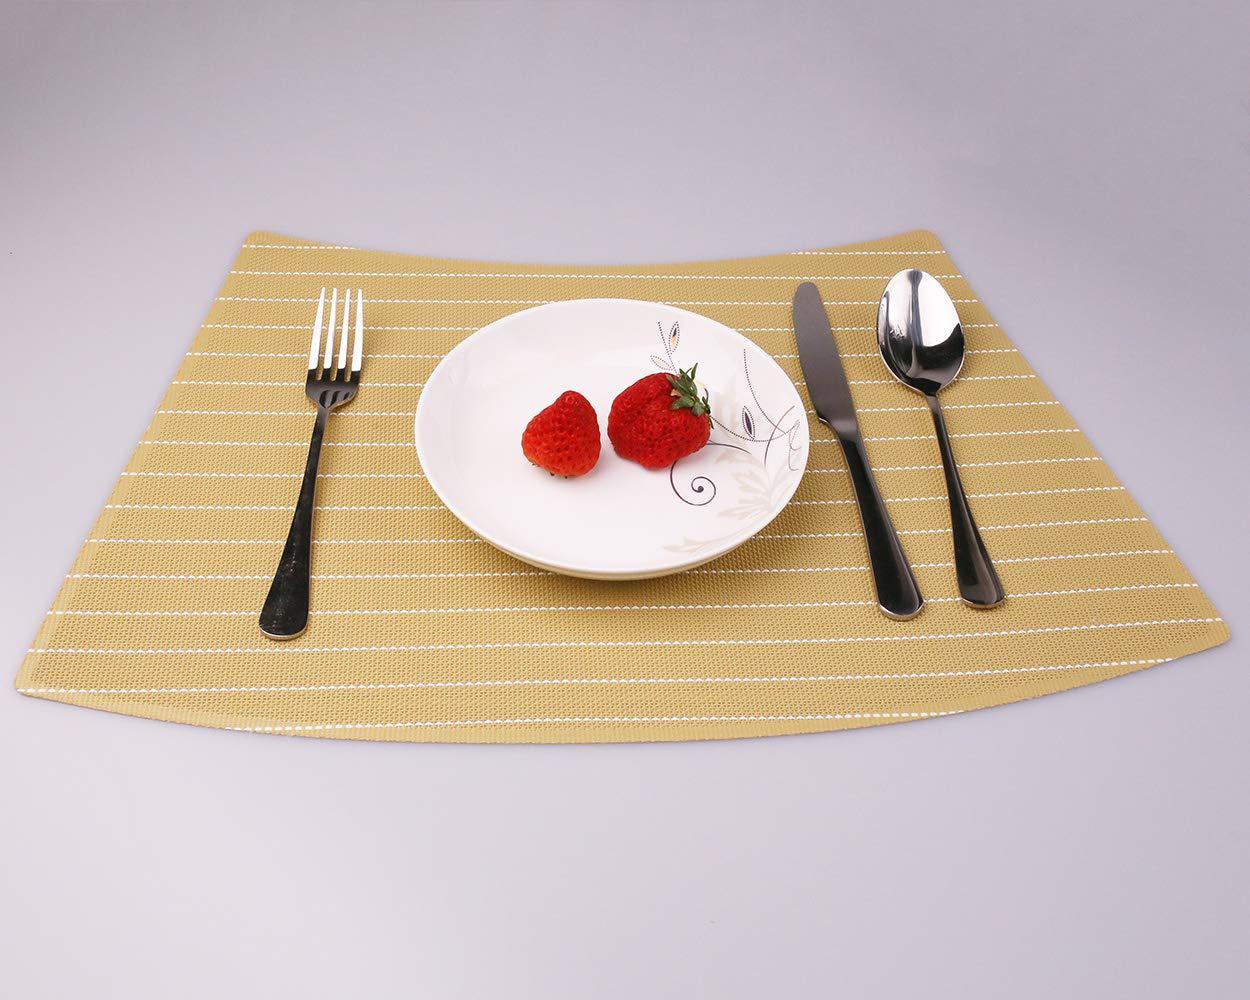 Convetu Round Table Mats Yellow PM07 Placemats for Dining Table Set of 4 Textilene PVC Vinyl Kitchen Farmhouse Stripe Style Non Slip Heat Resistant Washable